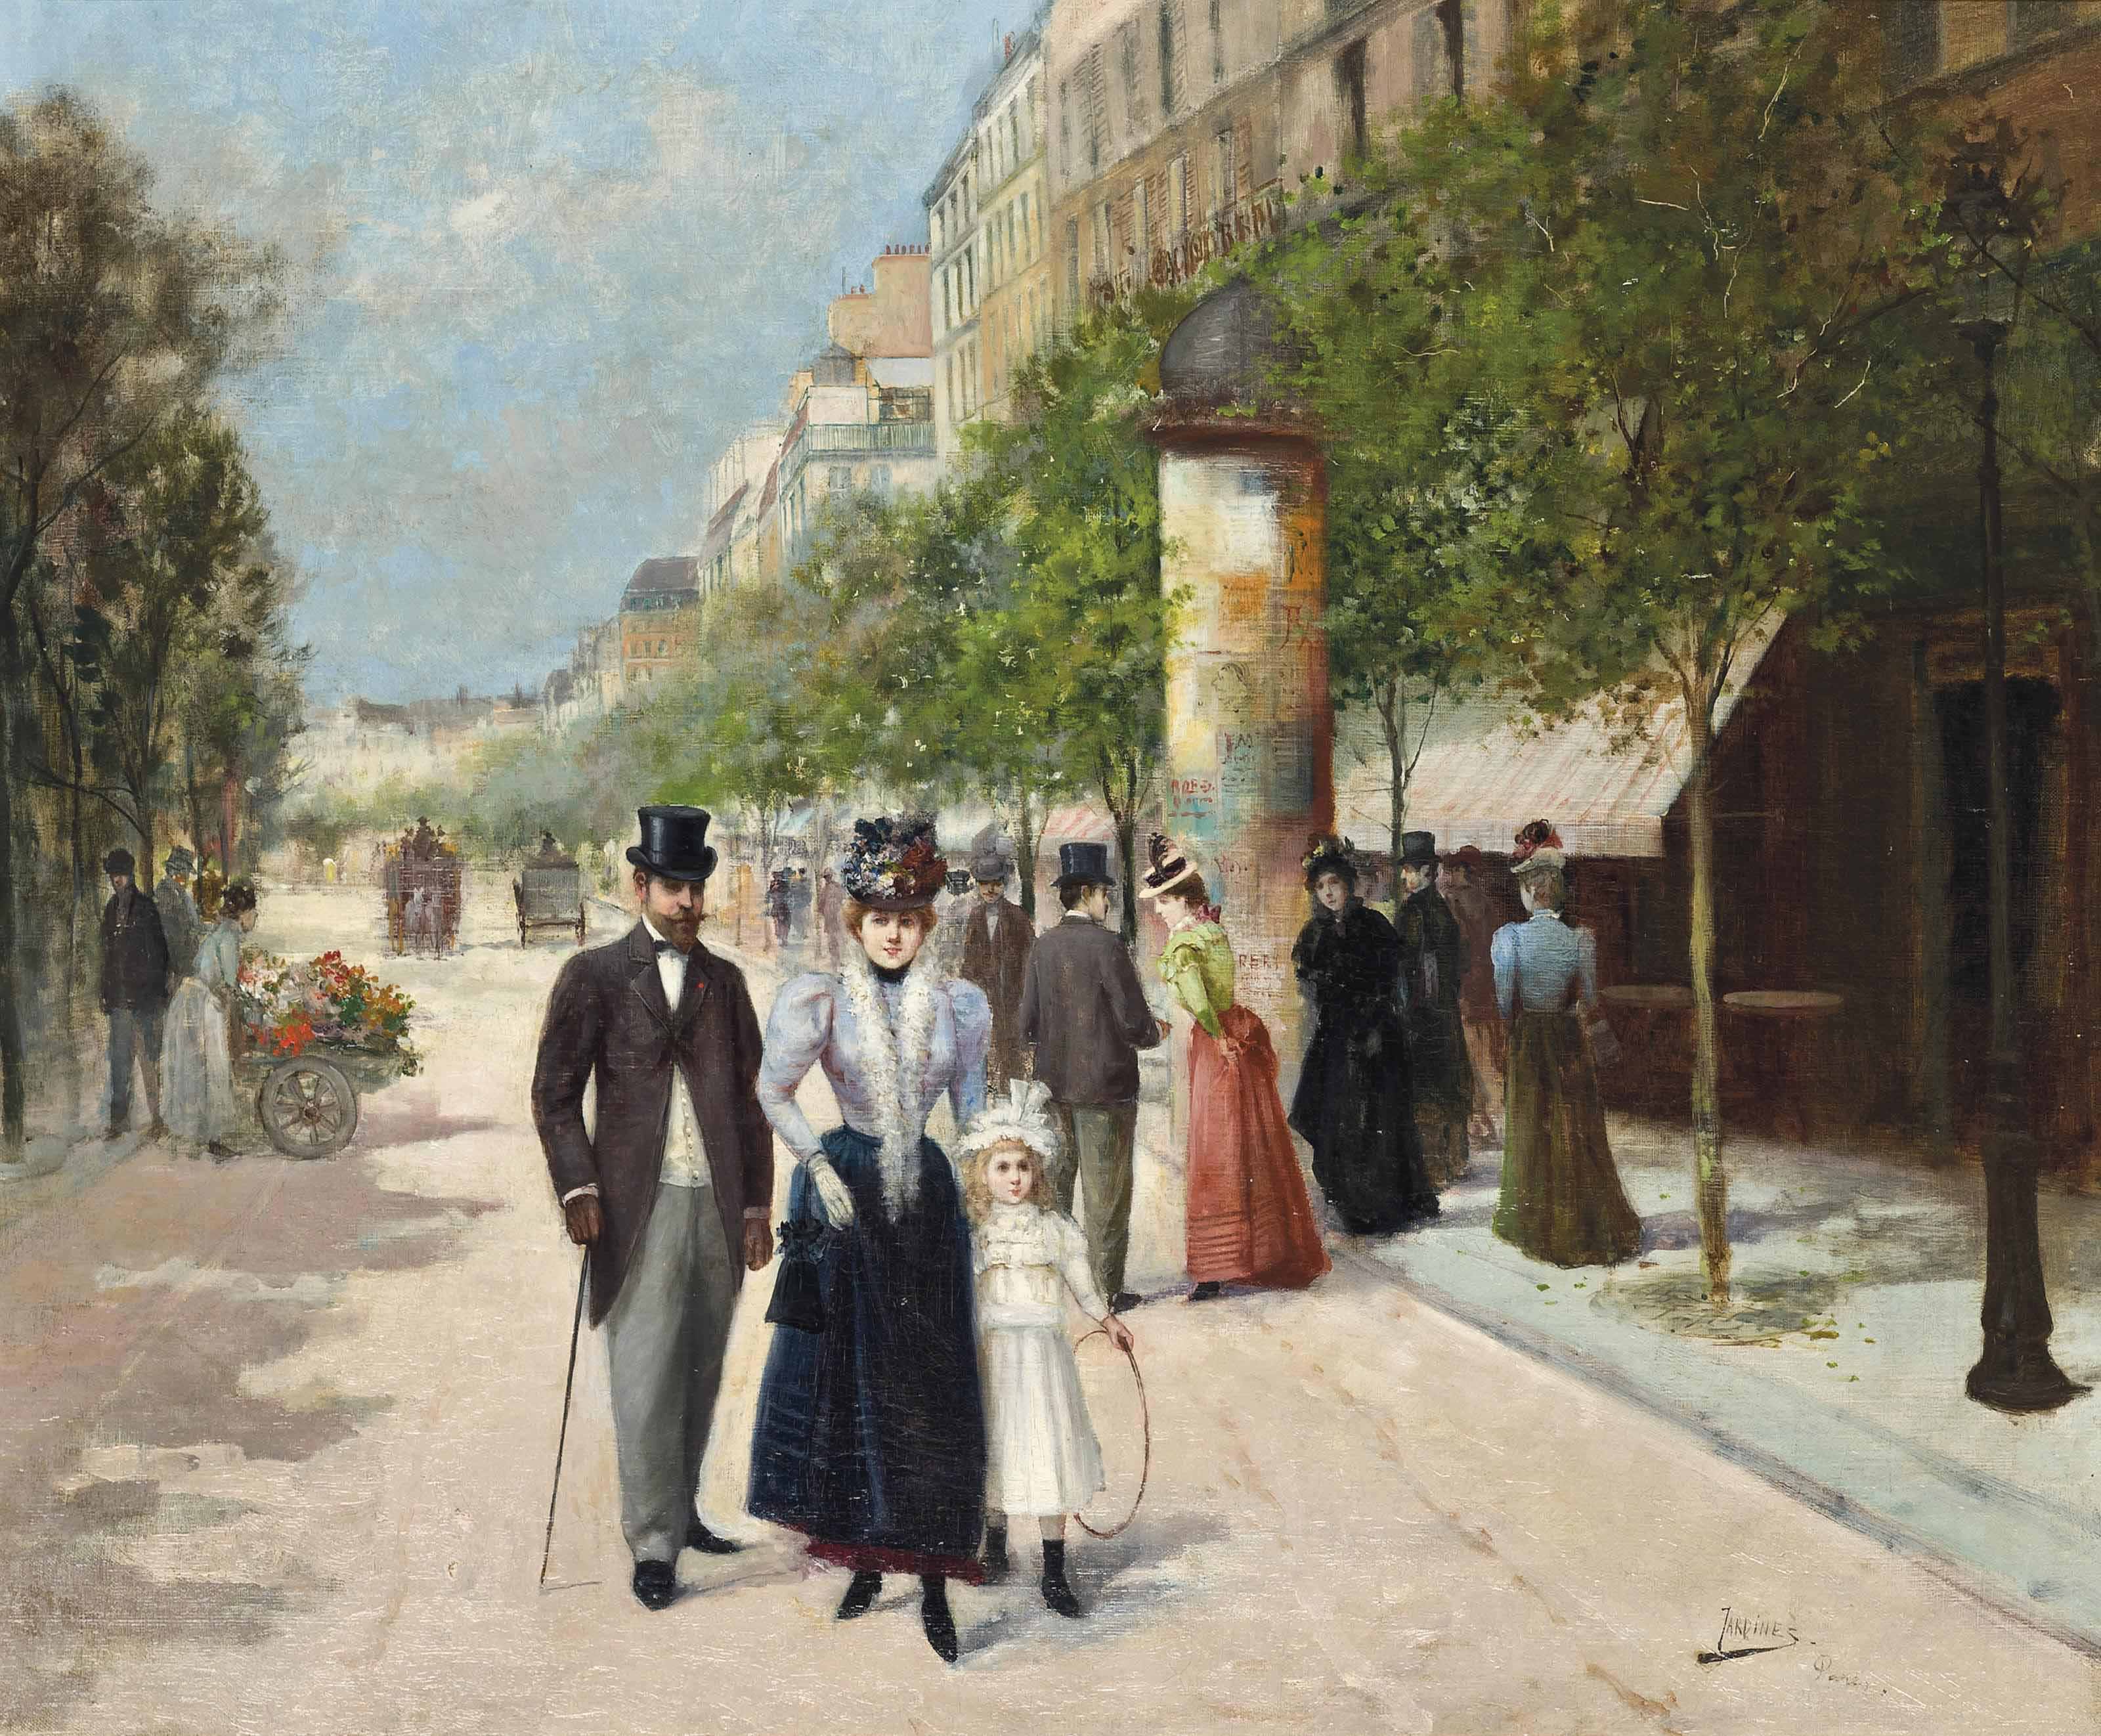 A stroll through the streets of Paris